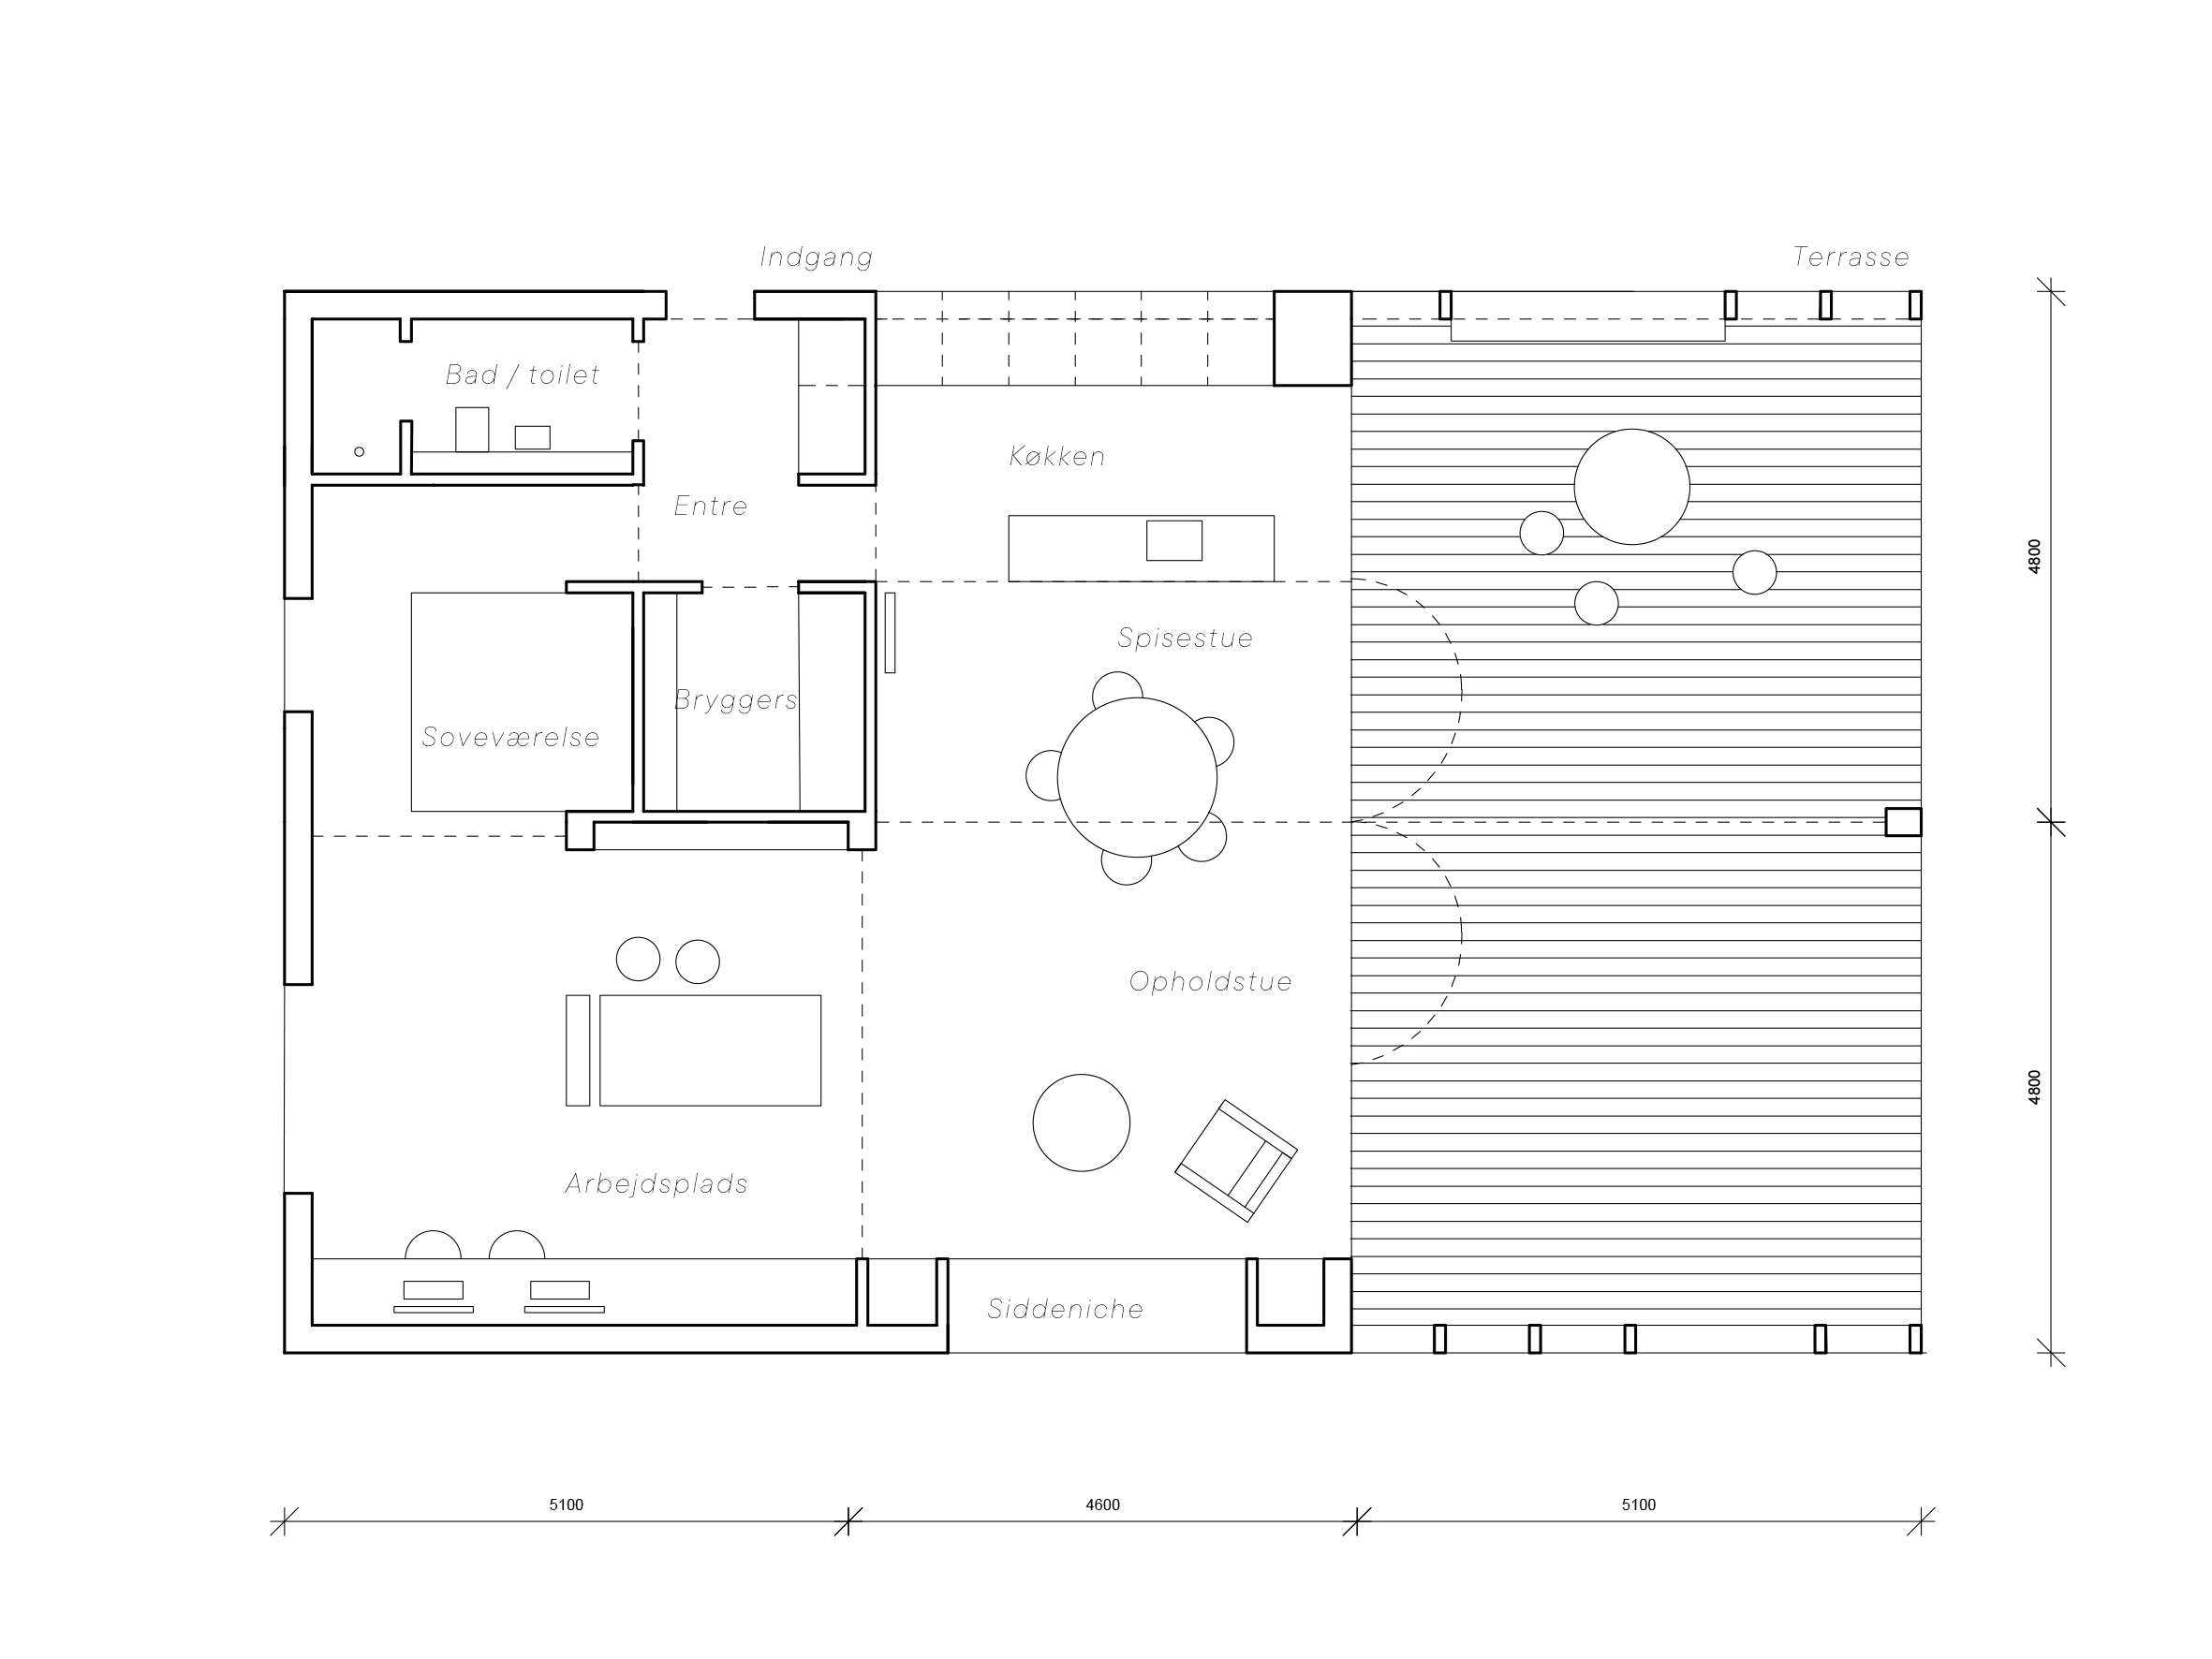 2 modul variant, plan